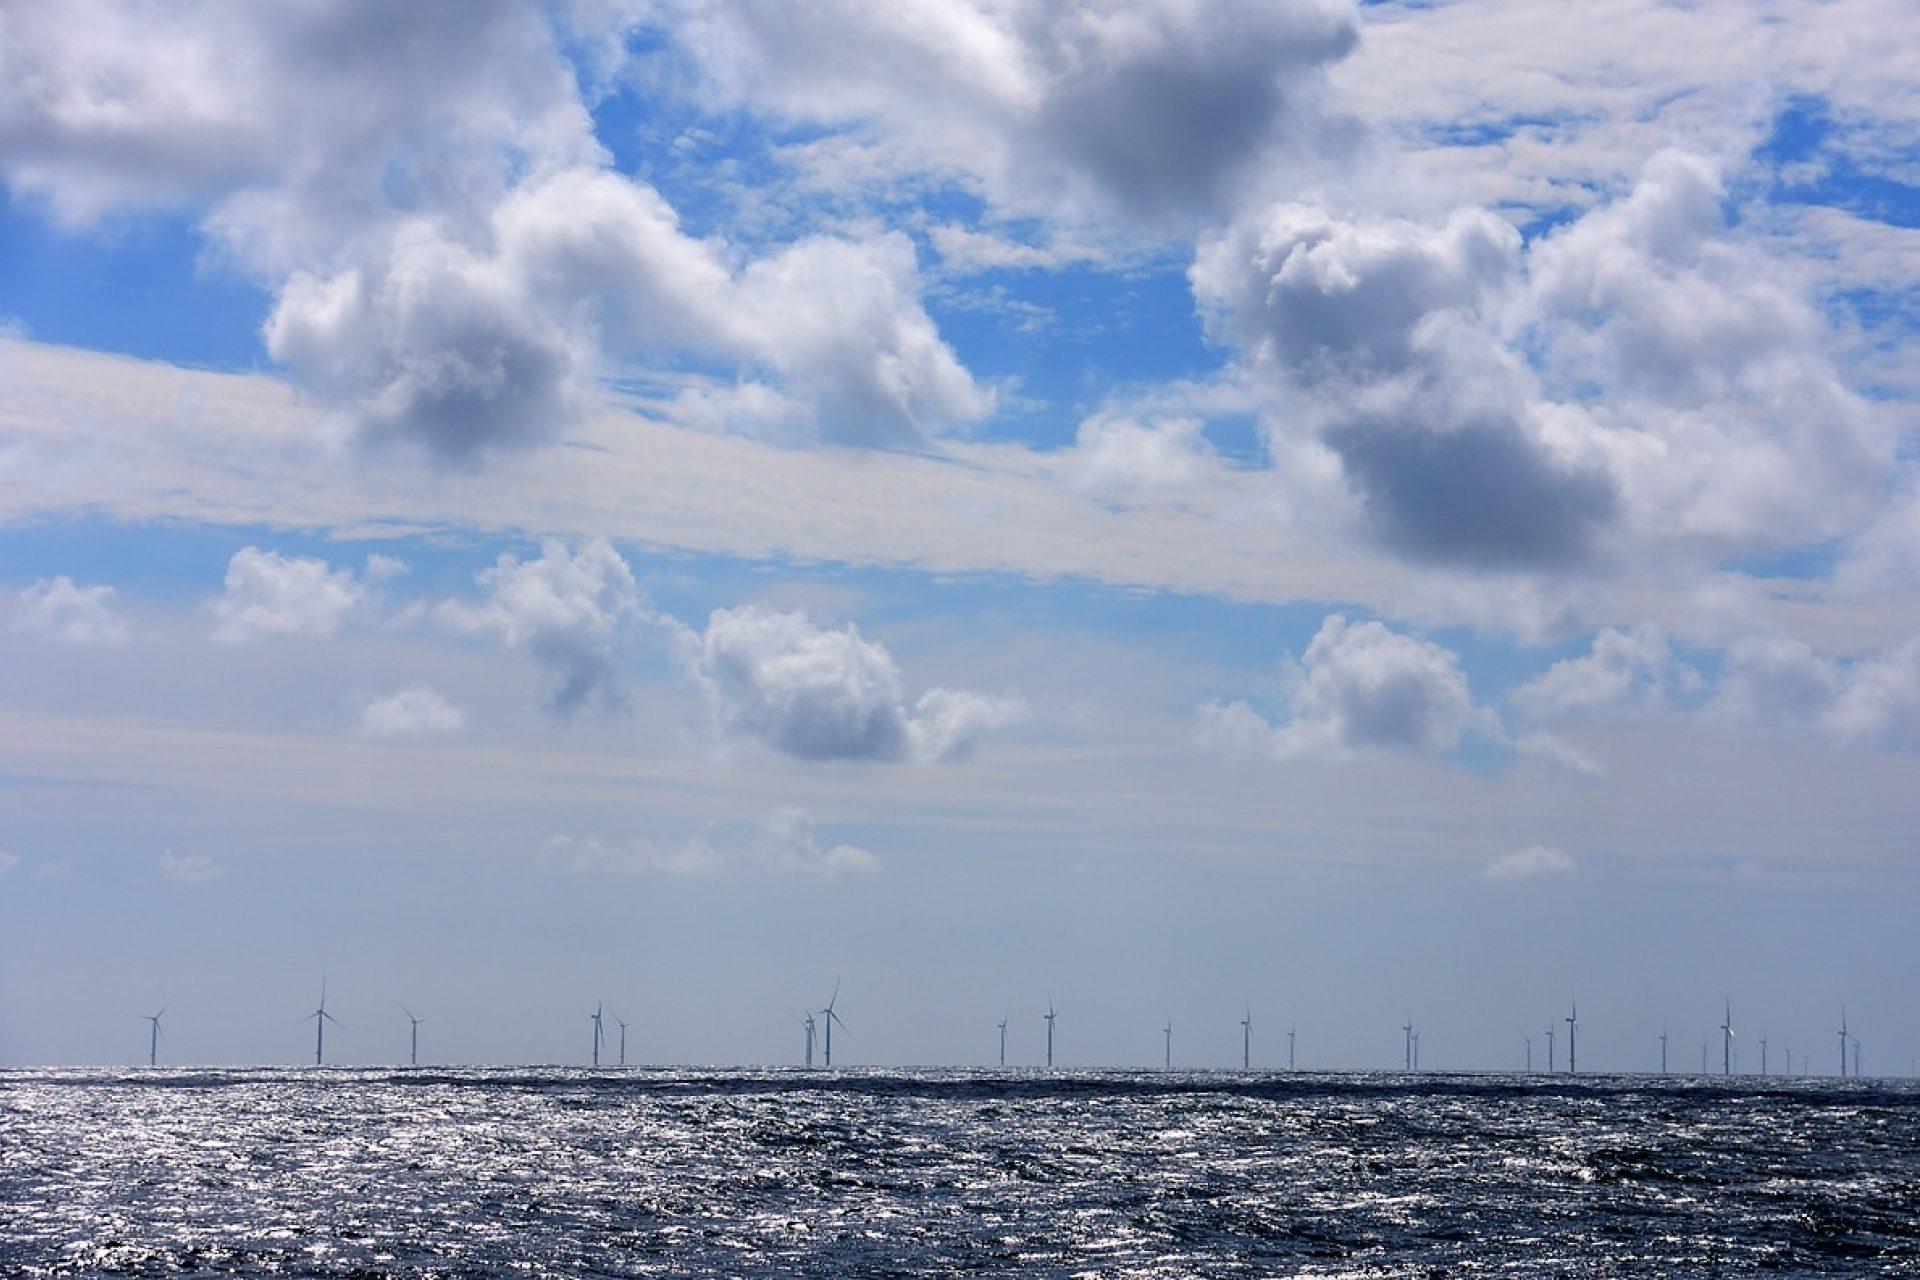 Sylt Reef Windmolen Denemarken OCEANA Carlos Minguel 3